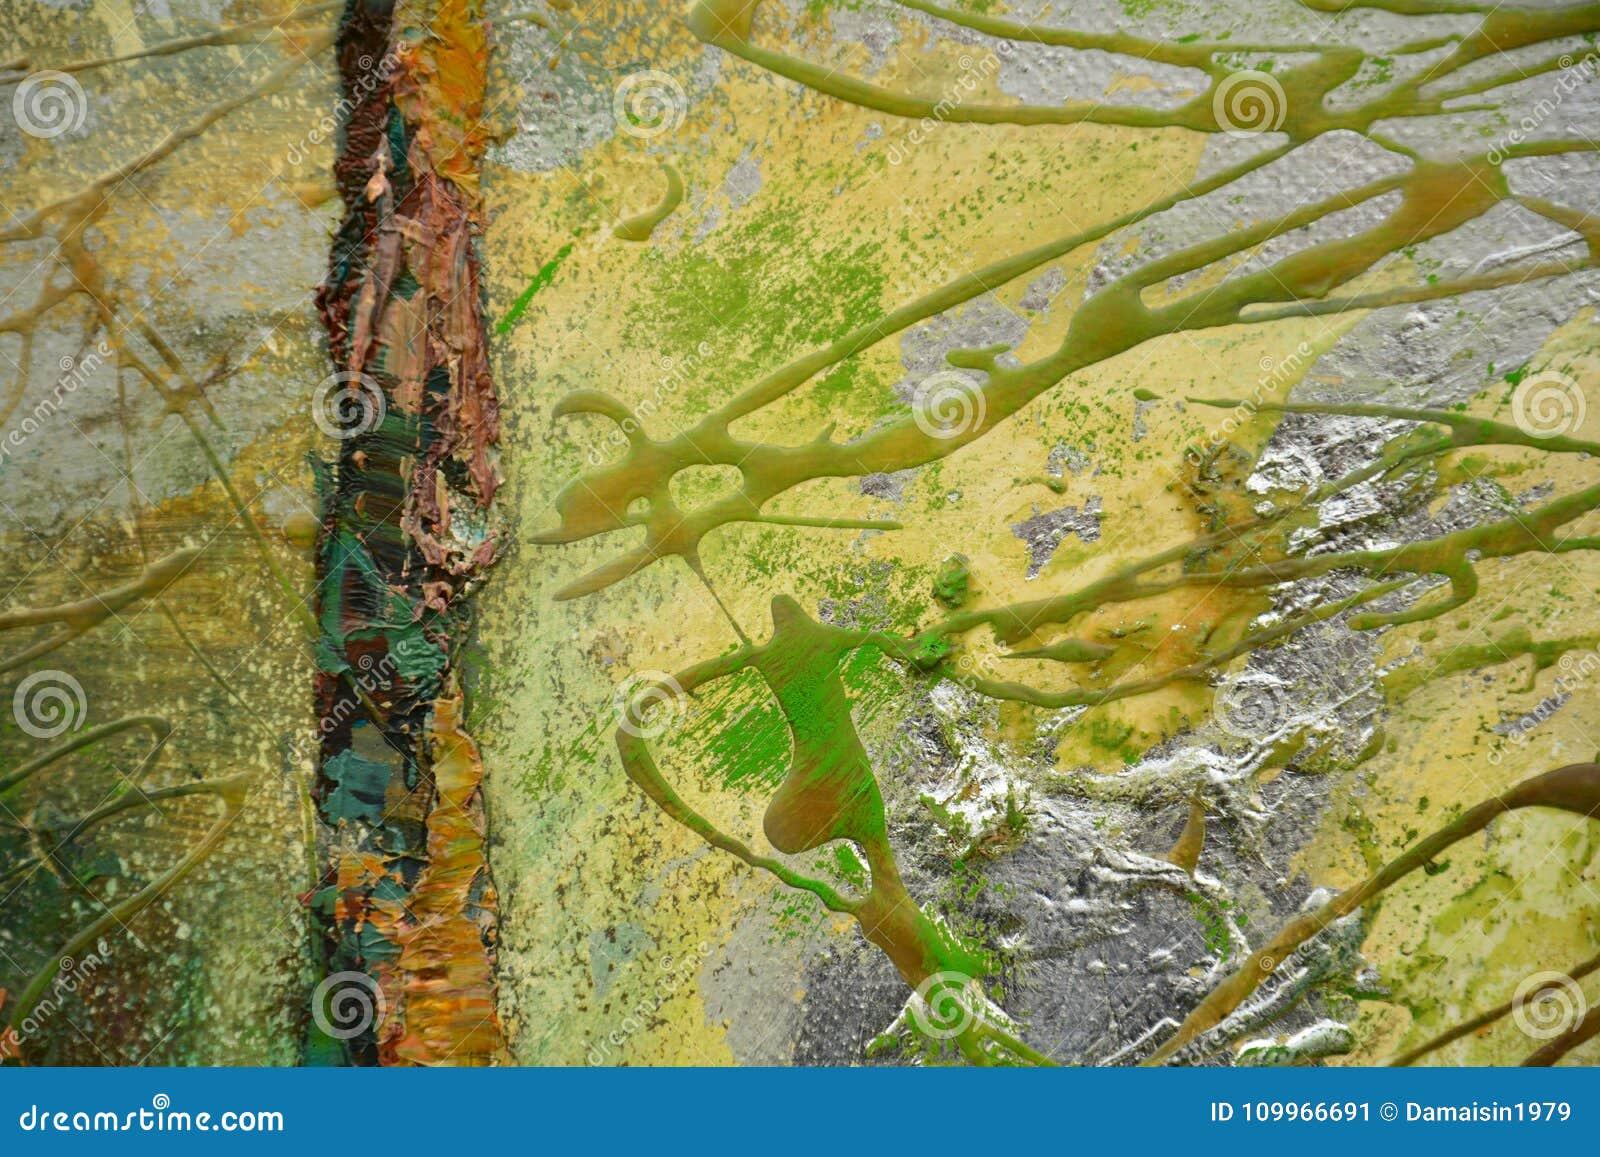 b85c9b78efb Paint Brown Orange Gold Green Brush Strokes